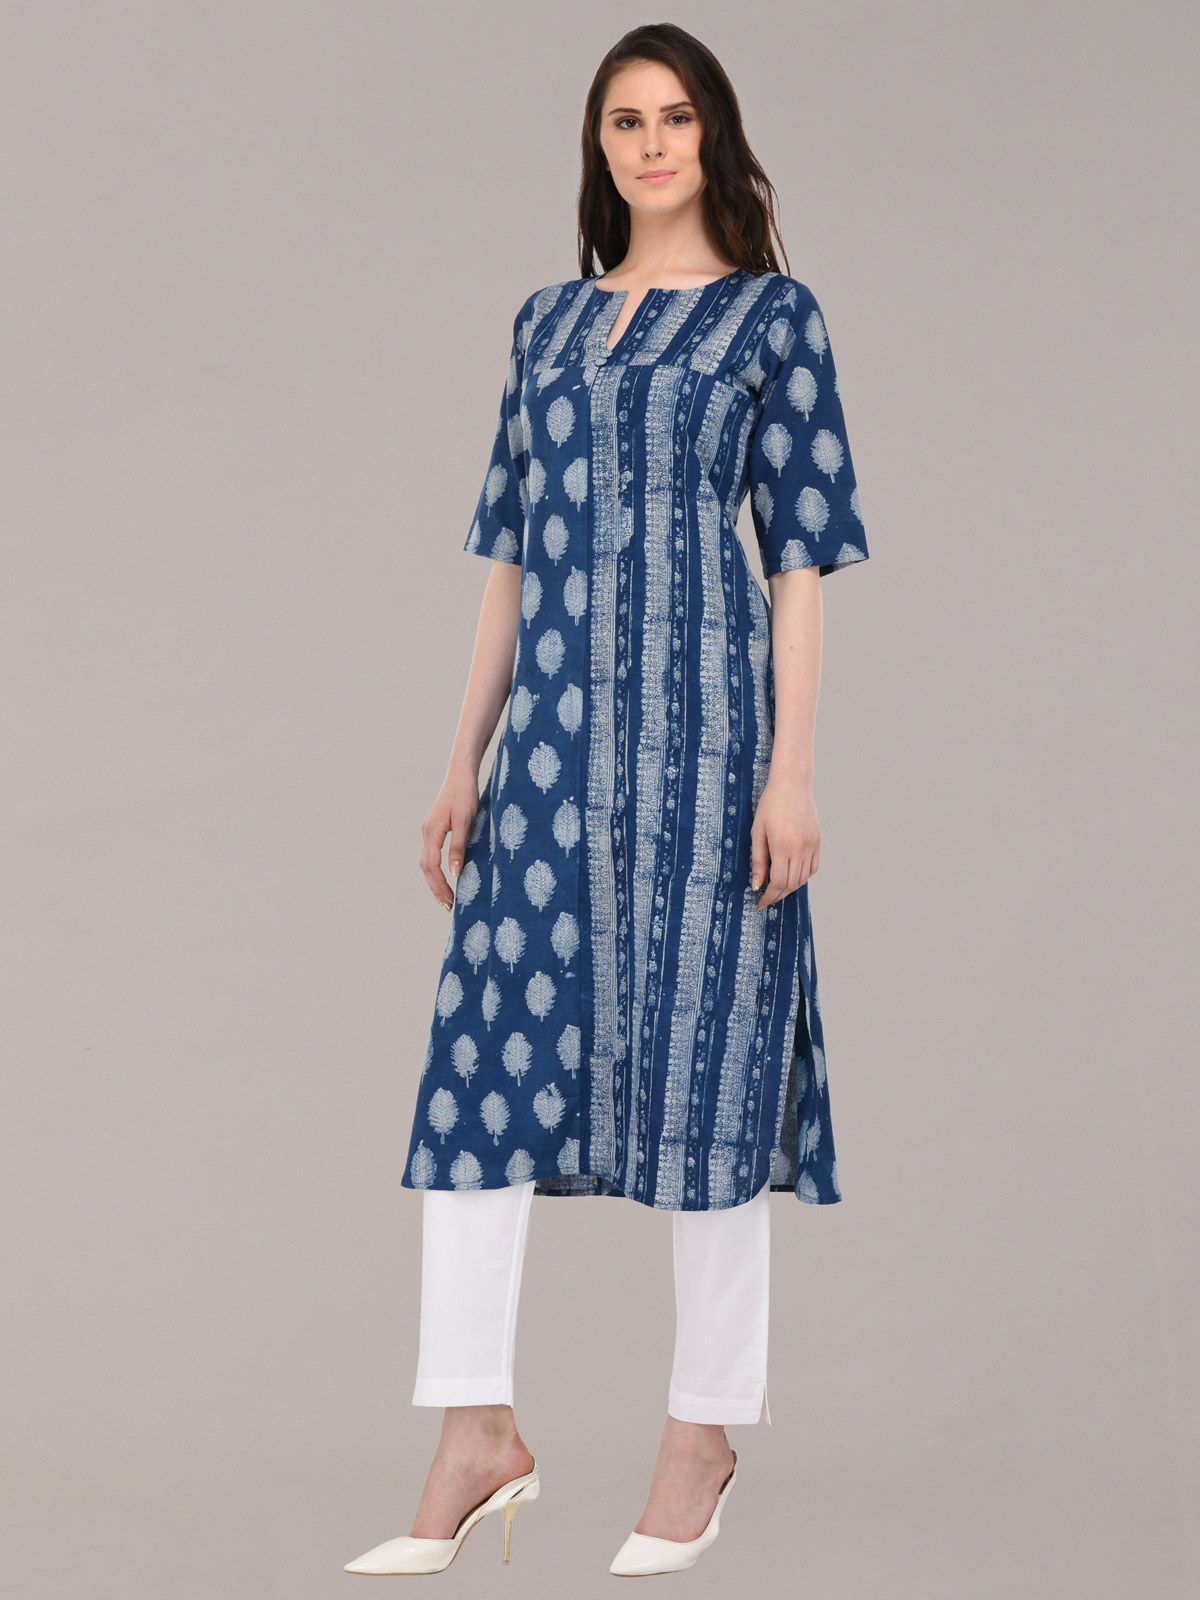 Azure indigo color hand-block printed cotton long kurti